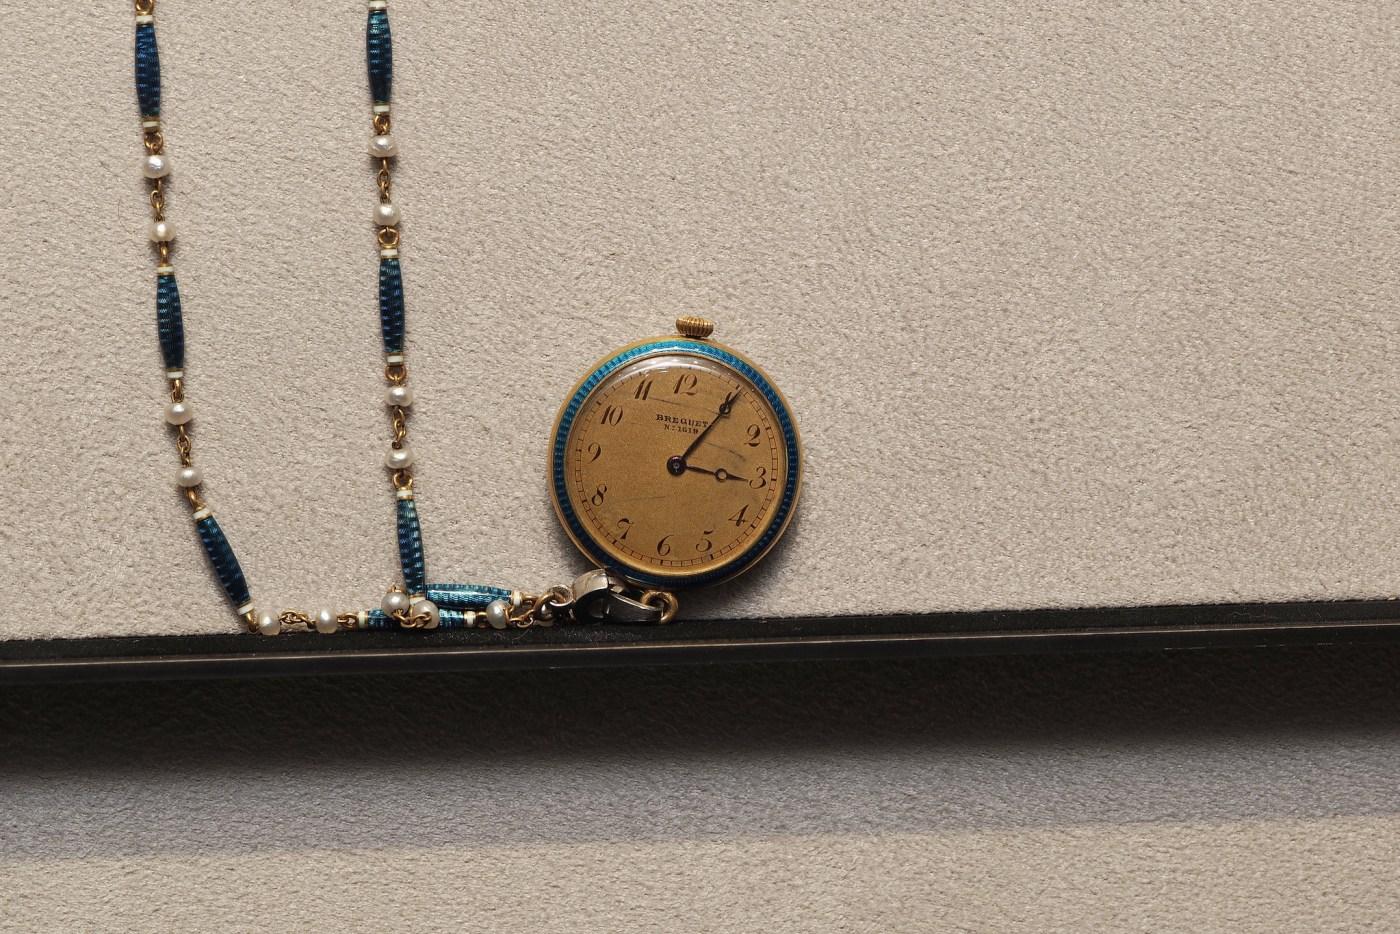 Breguet Pendant watch on display at the Breguet Museum of Paris